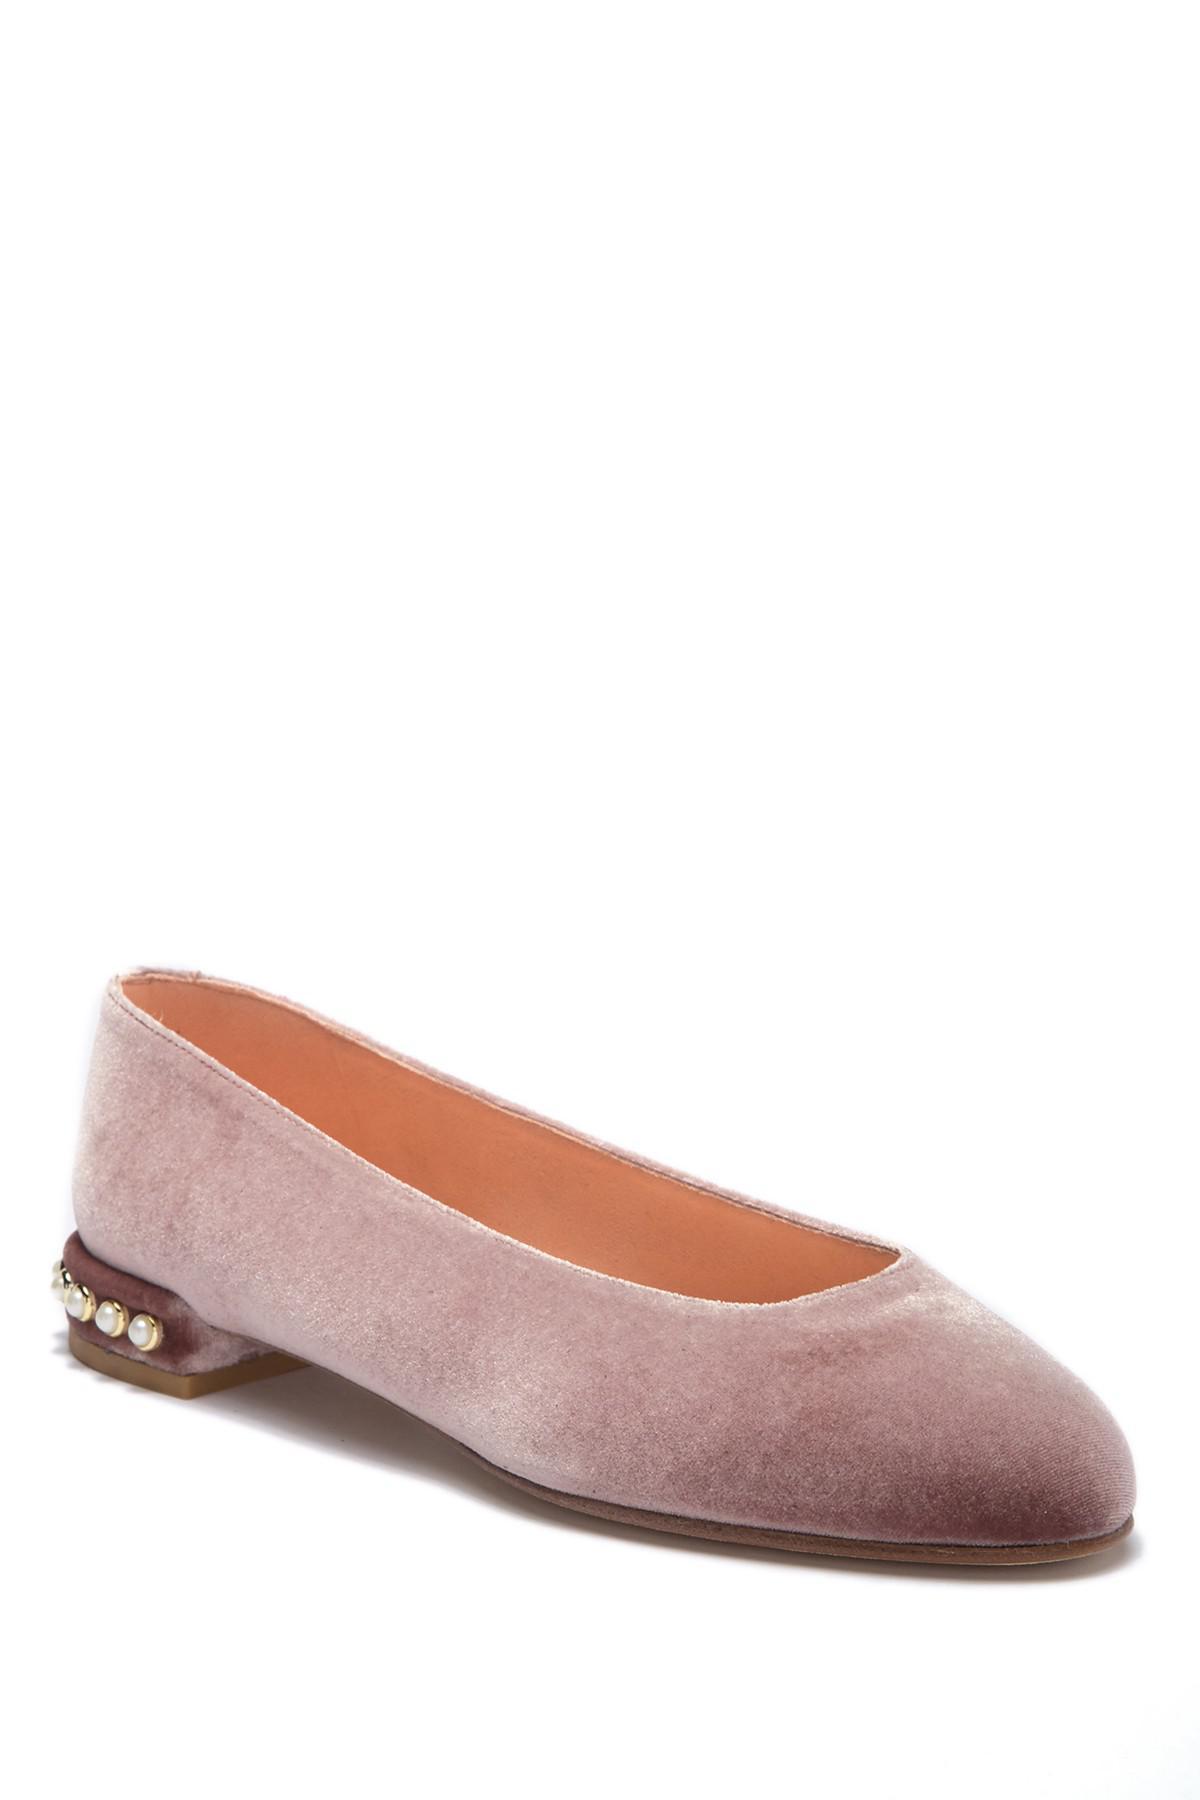 temperament shoes authorized site skate shoes Stuart Weitzman Suede Chic Pearl Ballet Flat - Lyst